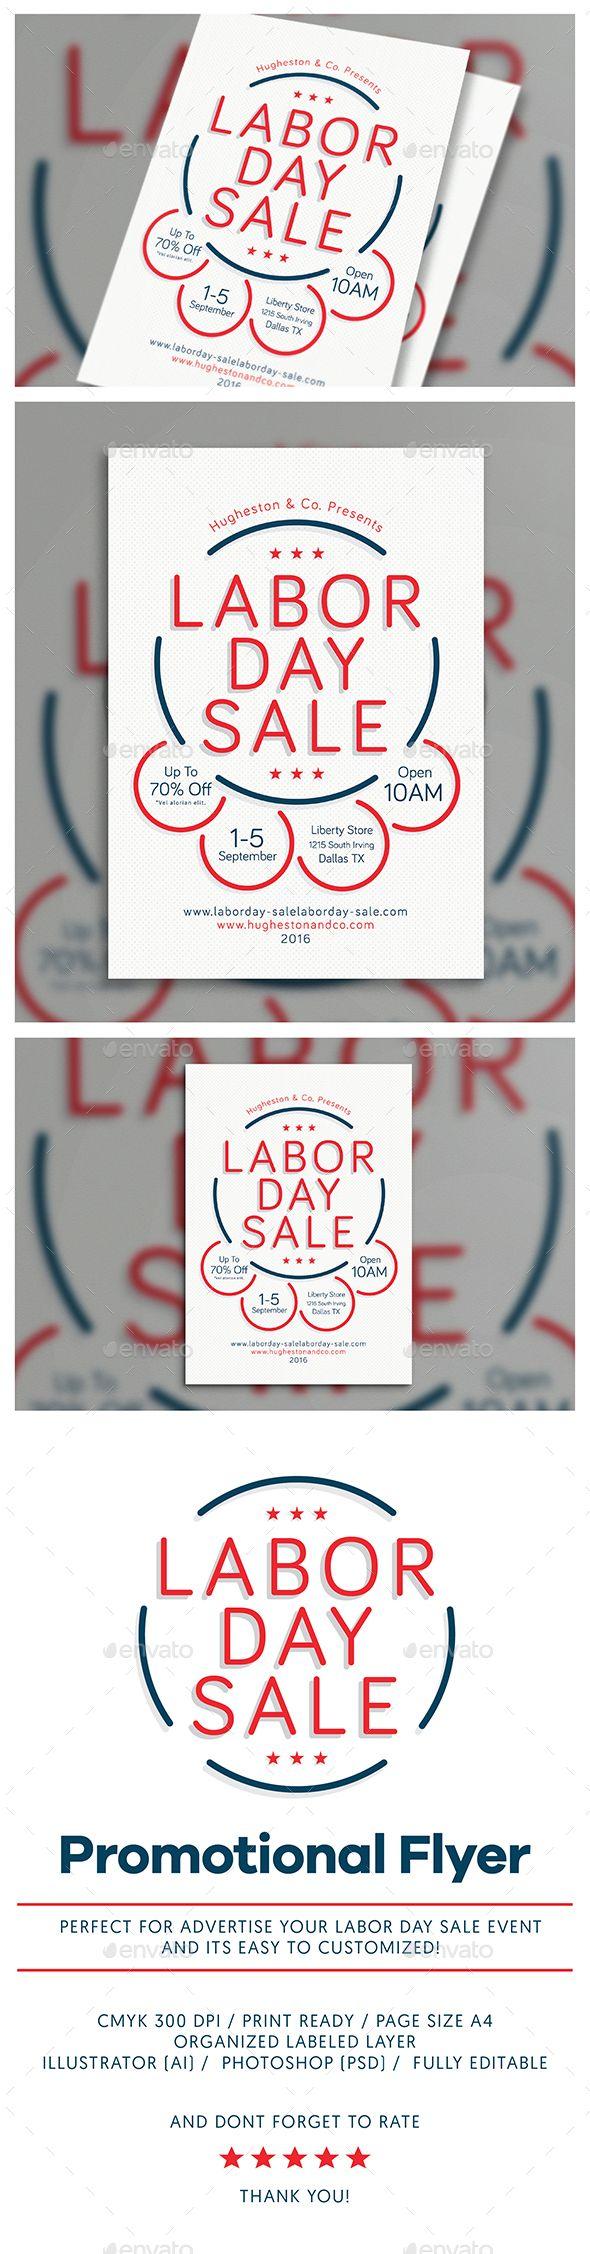 Labor Day Flyer Template PSD, AI Illustrator